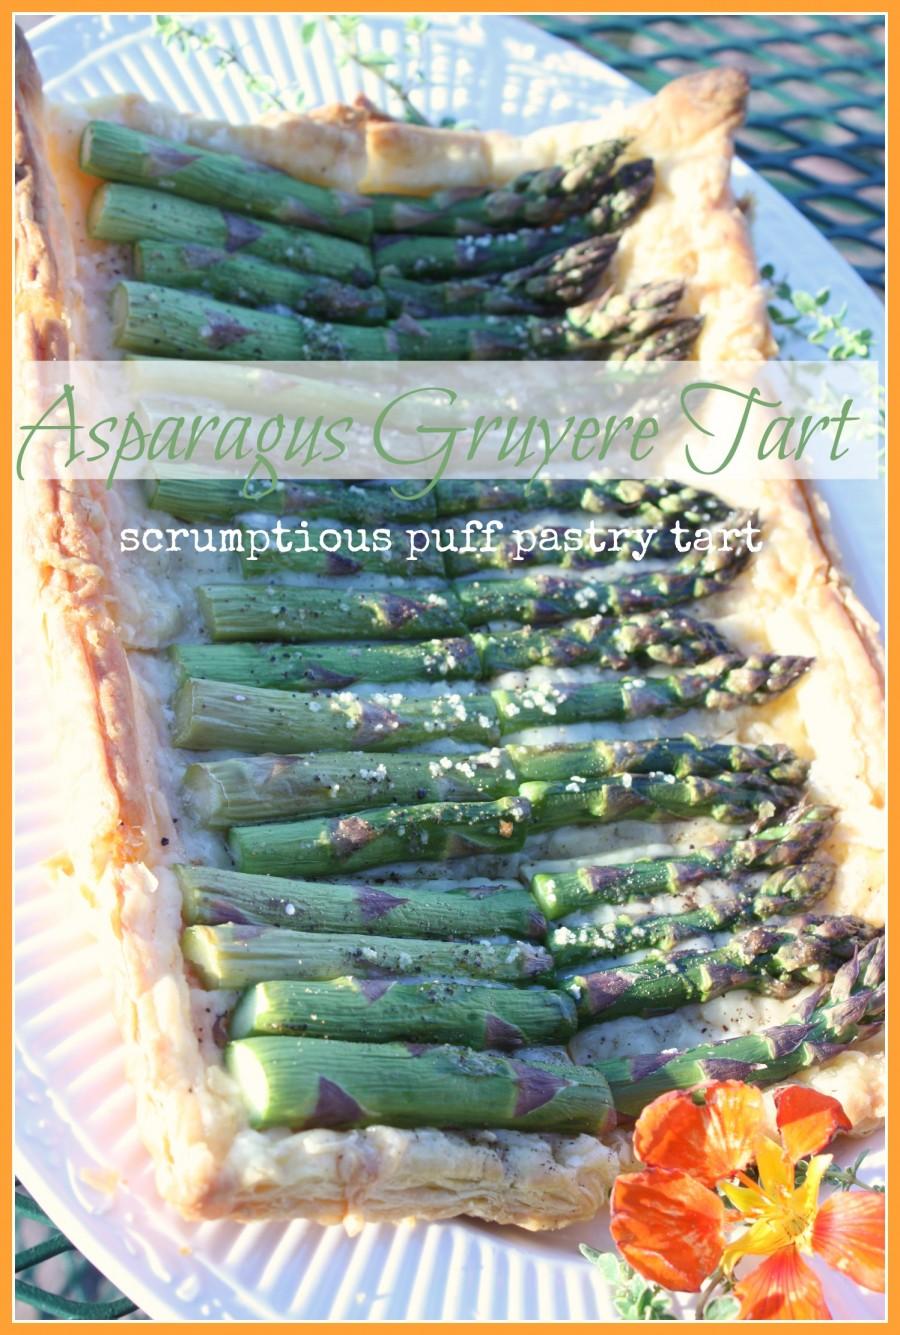 ASPARAGUS GRUYERE TART- Scrumptious puff pastry tart-stonegableblog.com